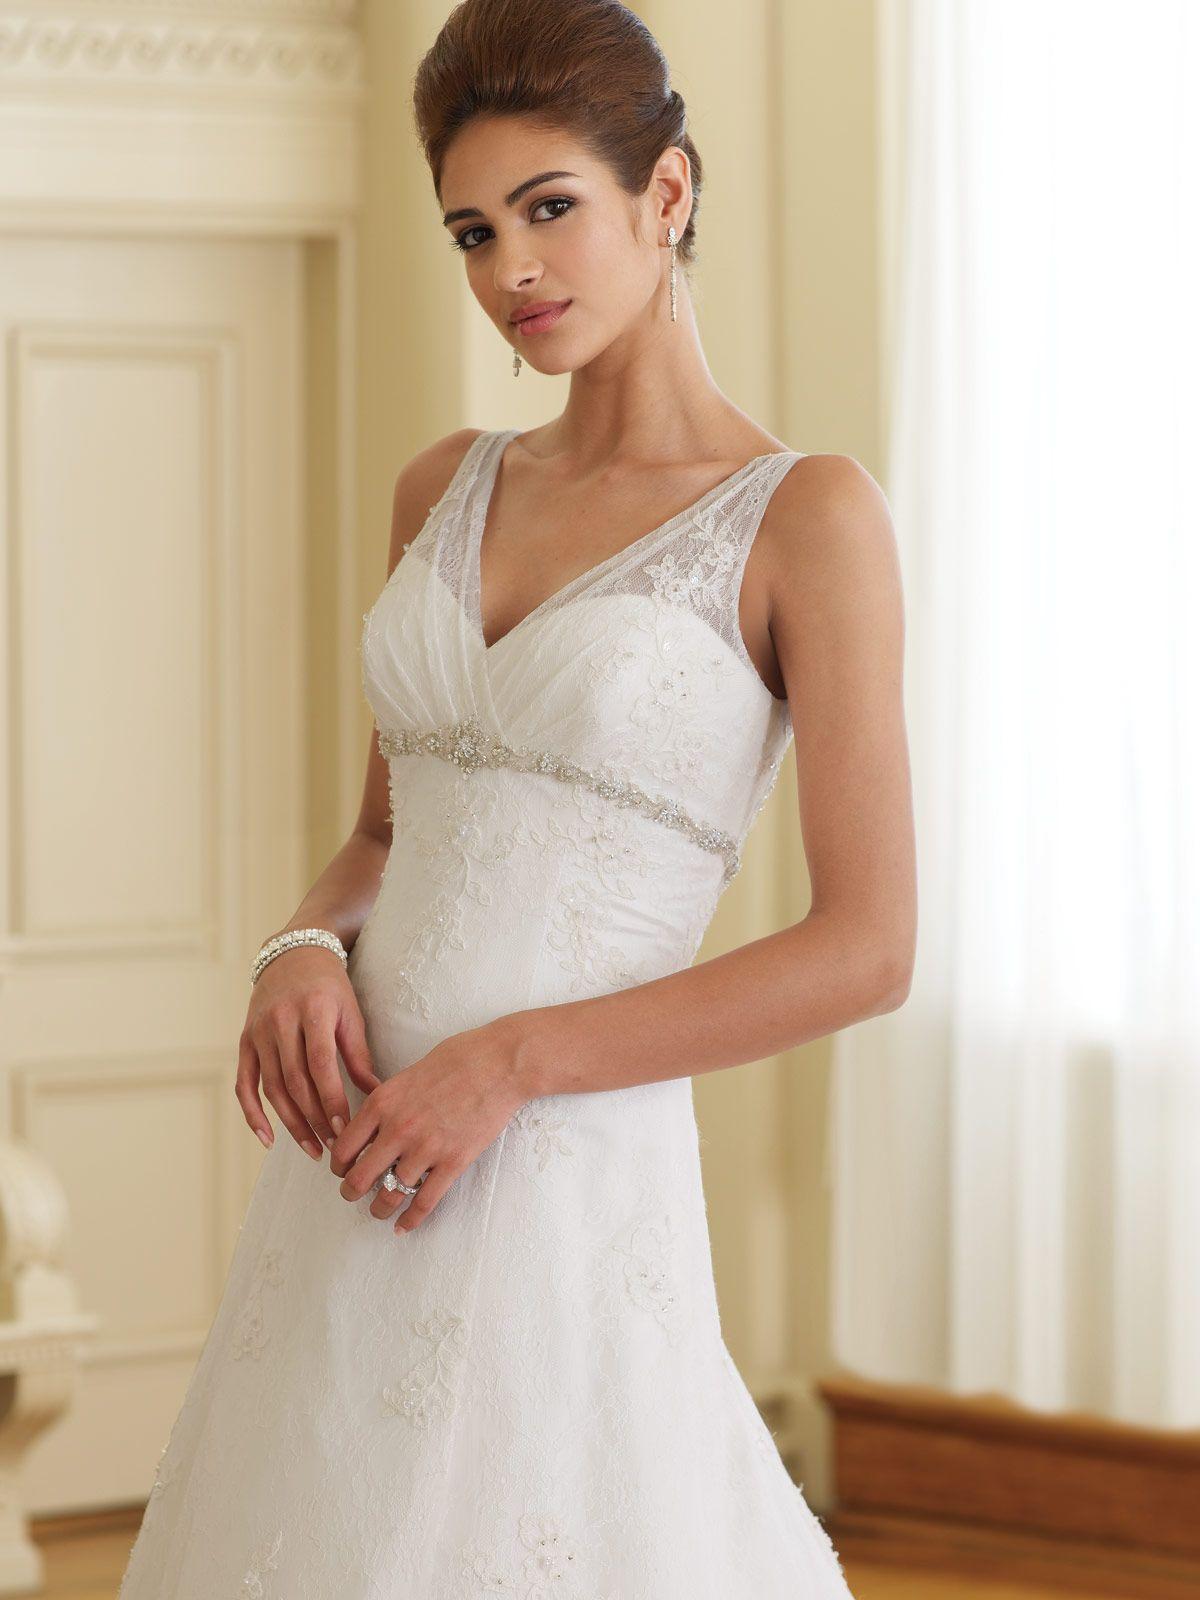 petite wedding dress best wedding dress for petite brides Choose Suitable Petite Wedding Dresses